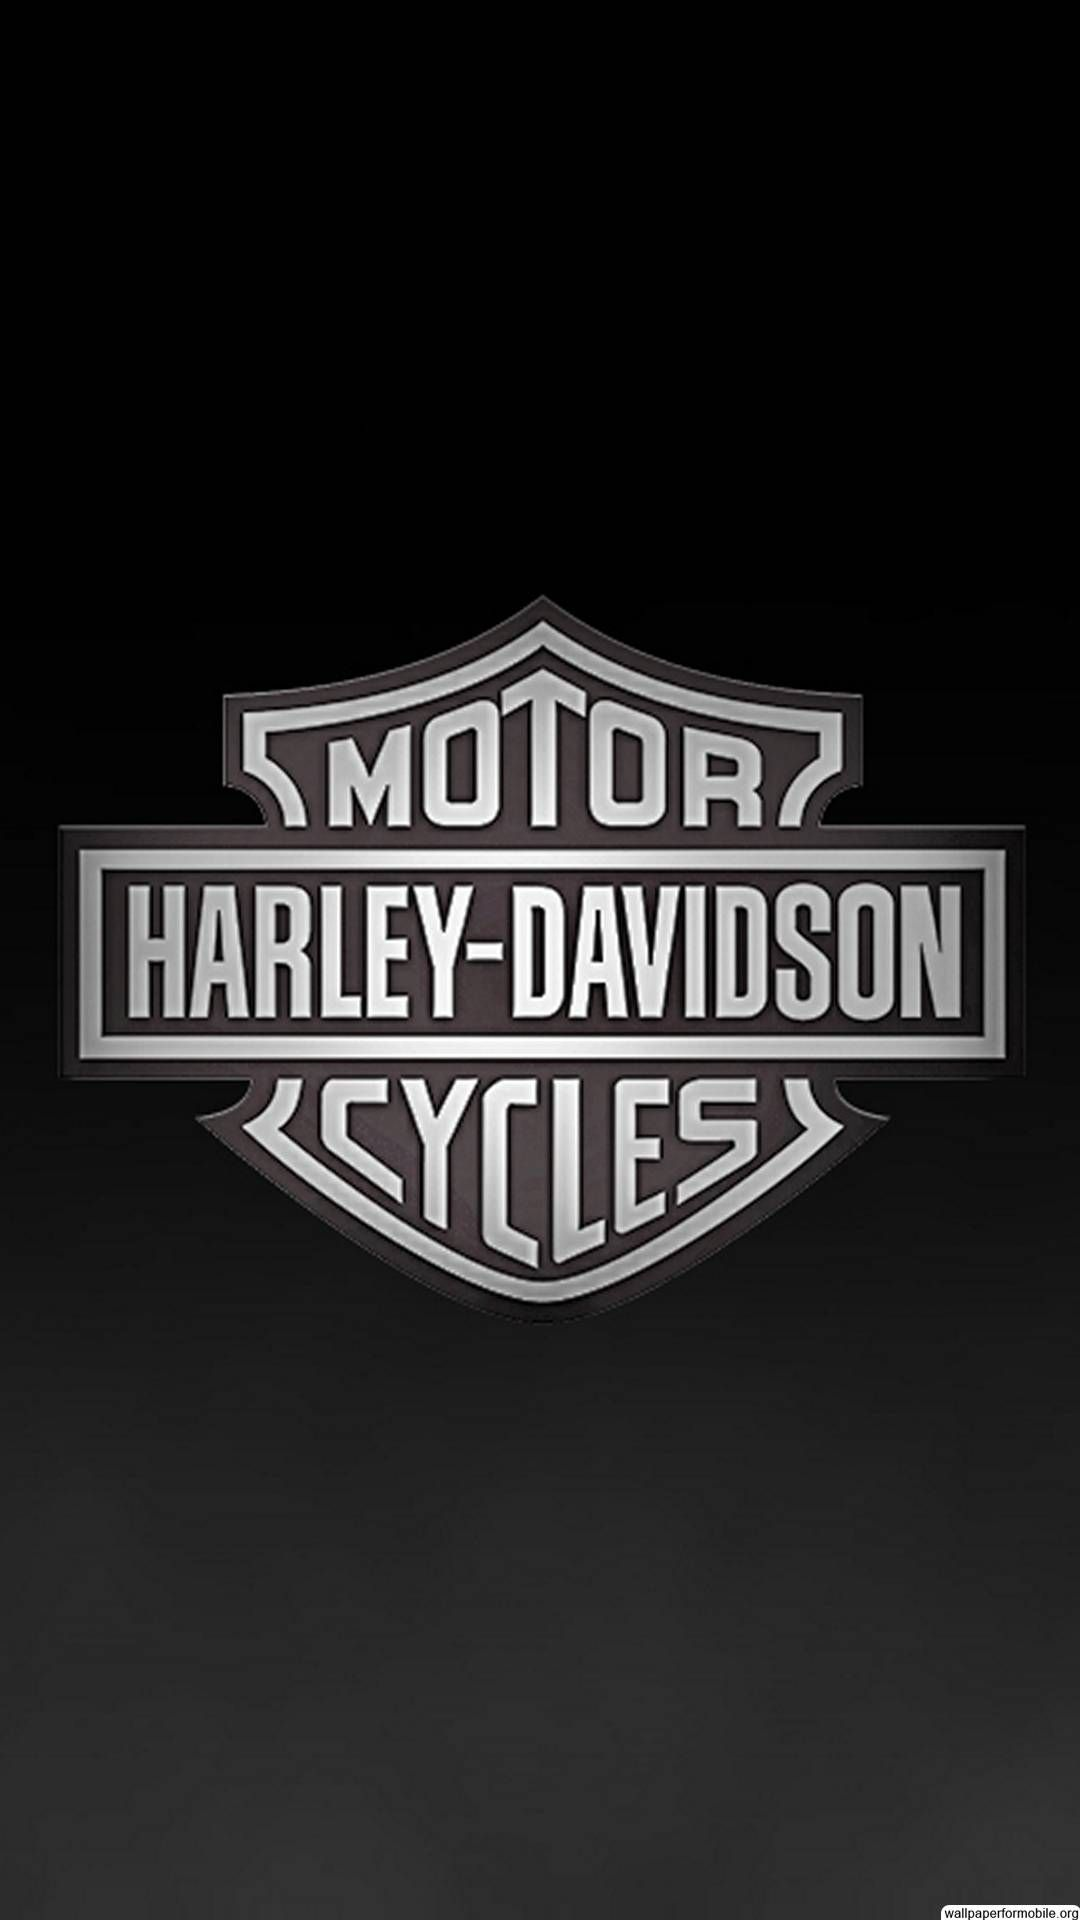 Harley Davidson Logo Hd Wallpapers